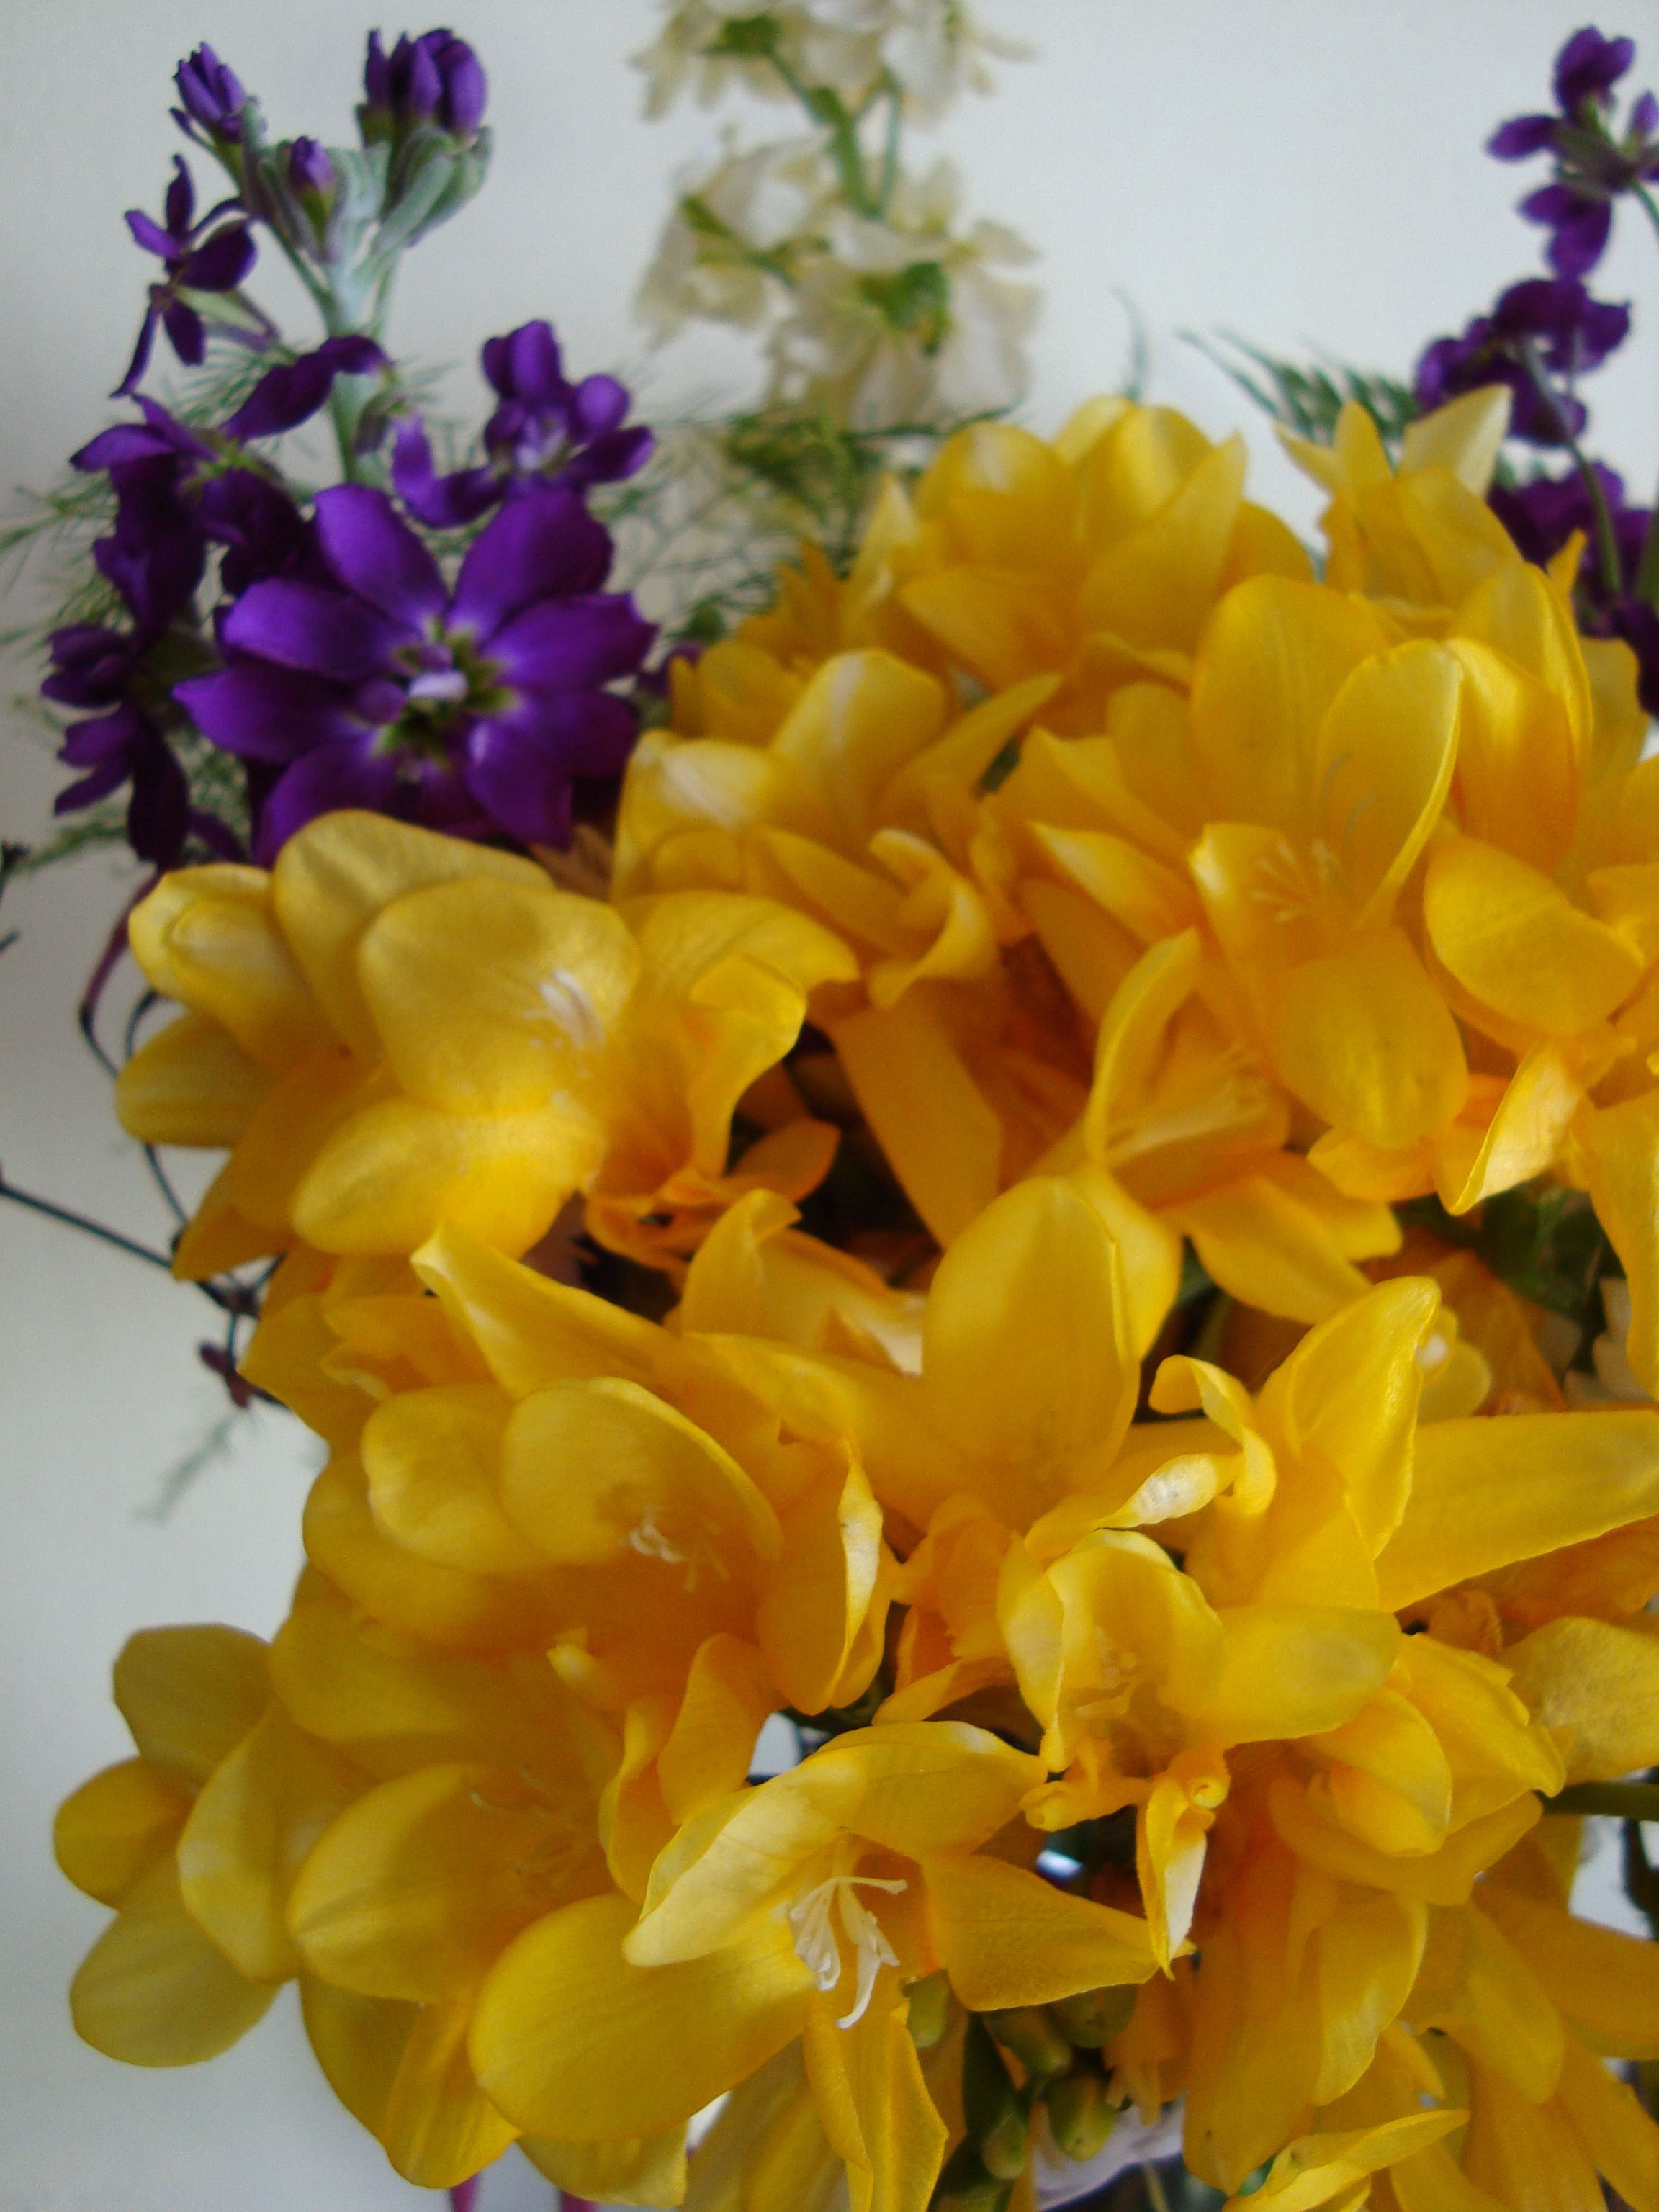 Yellow Freesia A Flower Freesia Gentiana Lisanthus